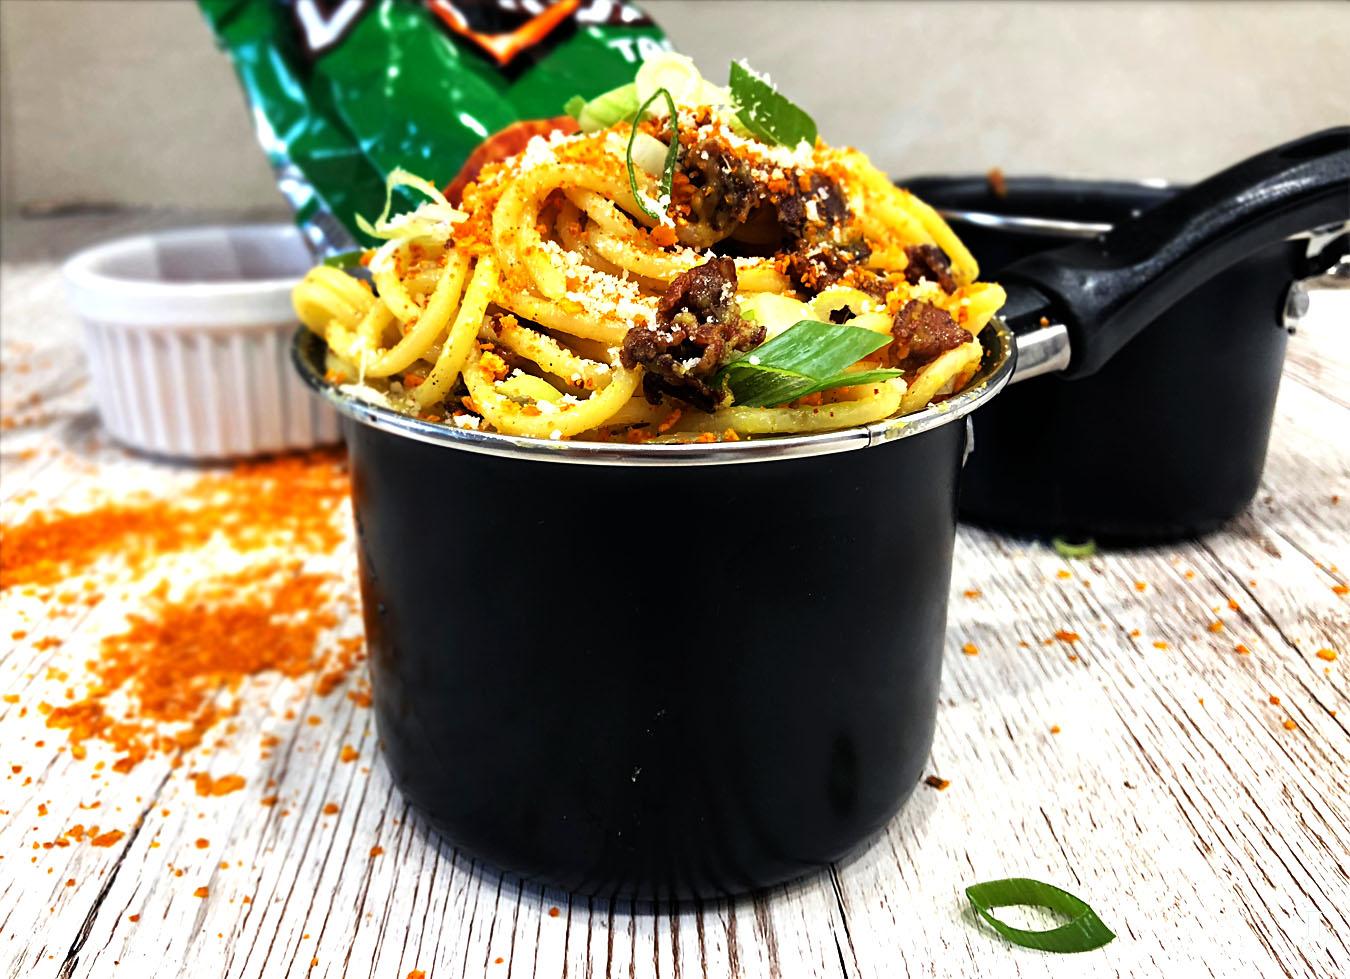 http://www.stonerchef.pl/wp-content/uploads/2018/08/spaghetti-doritonara.jpg